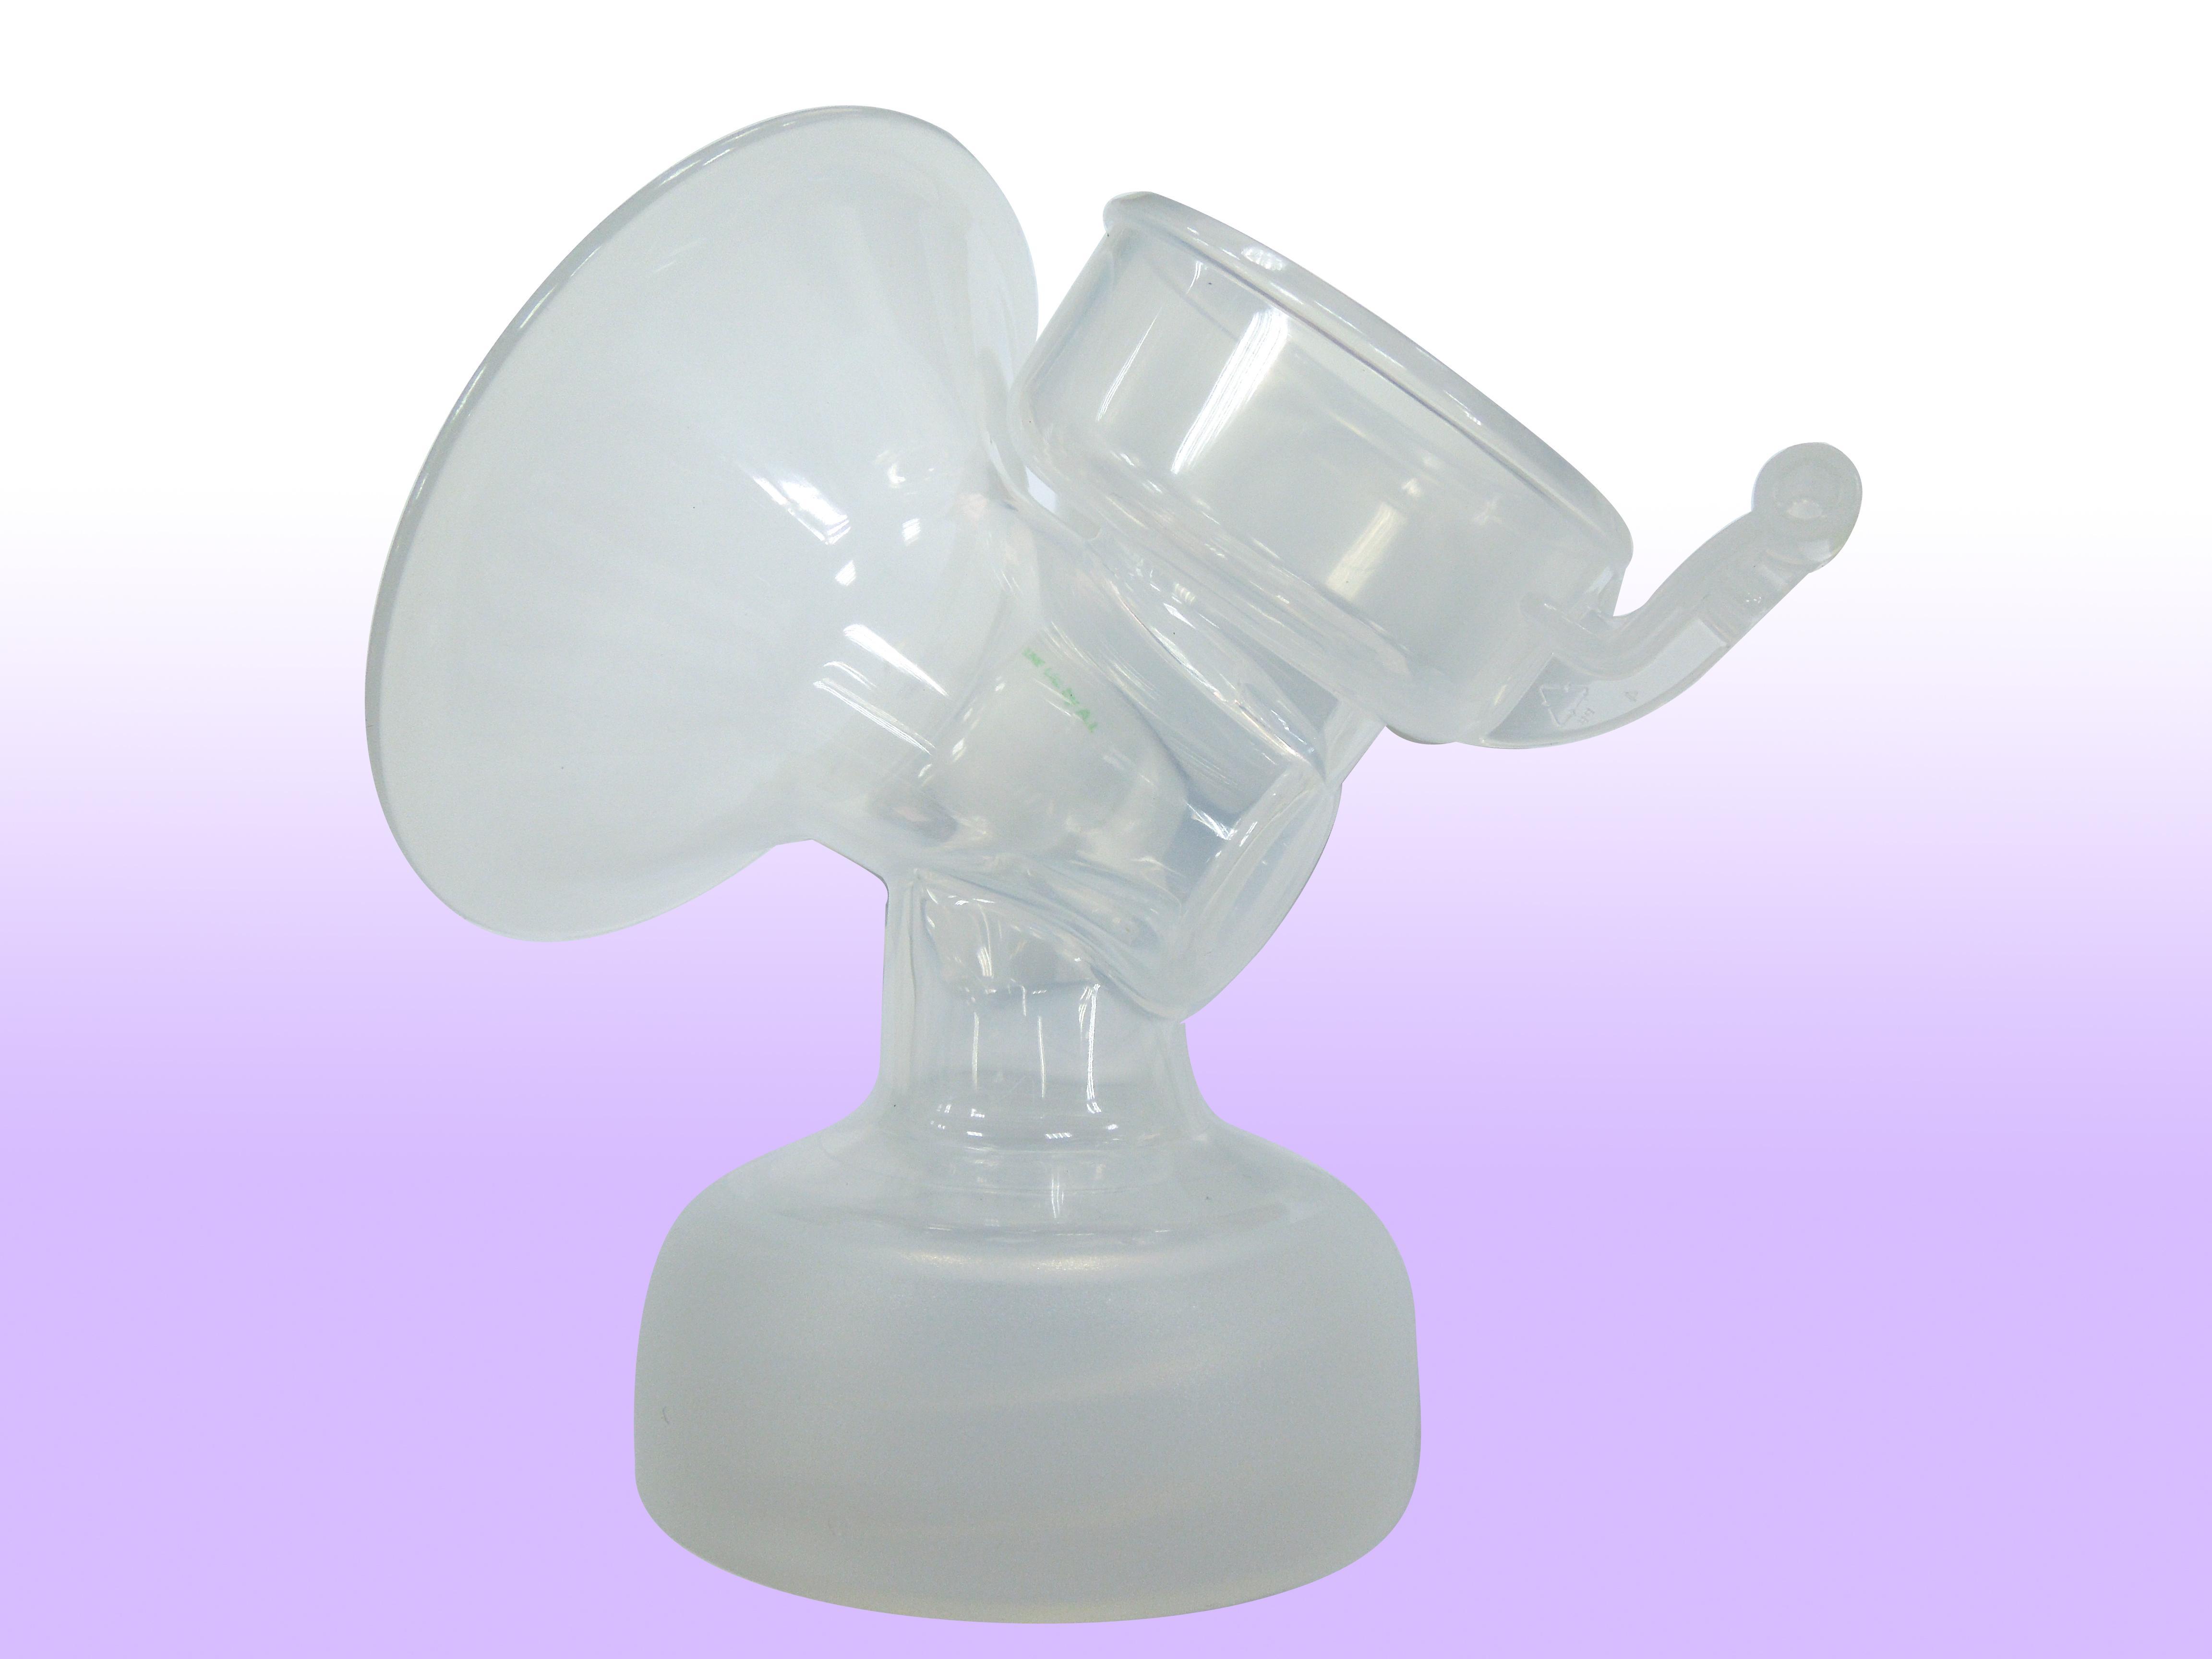 AVENT 輕乳感吸乳器專用喇叭主體